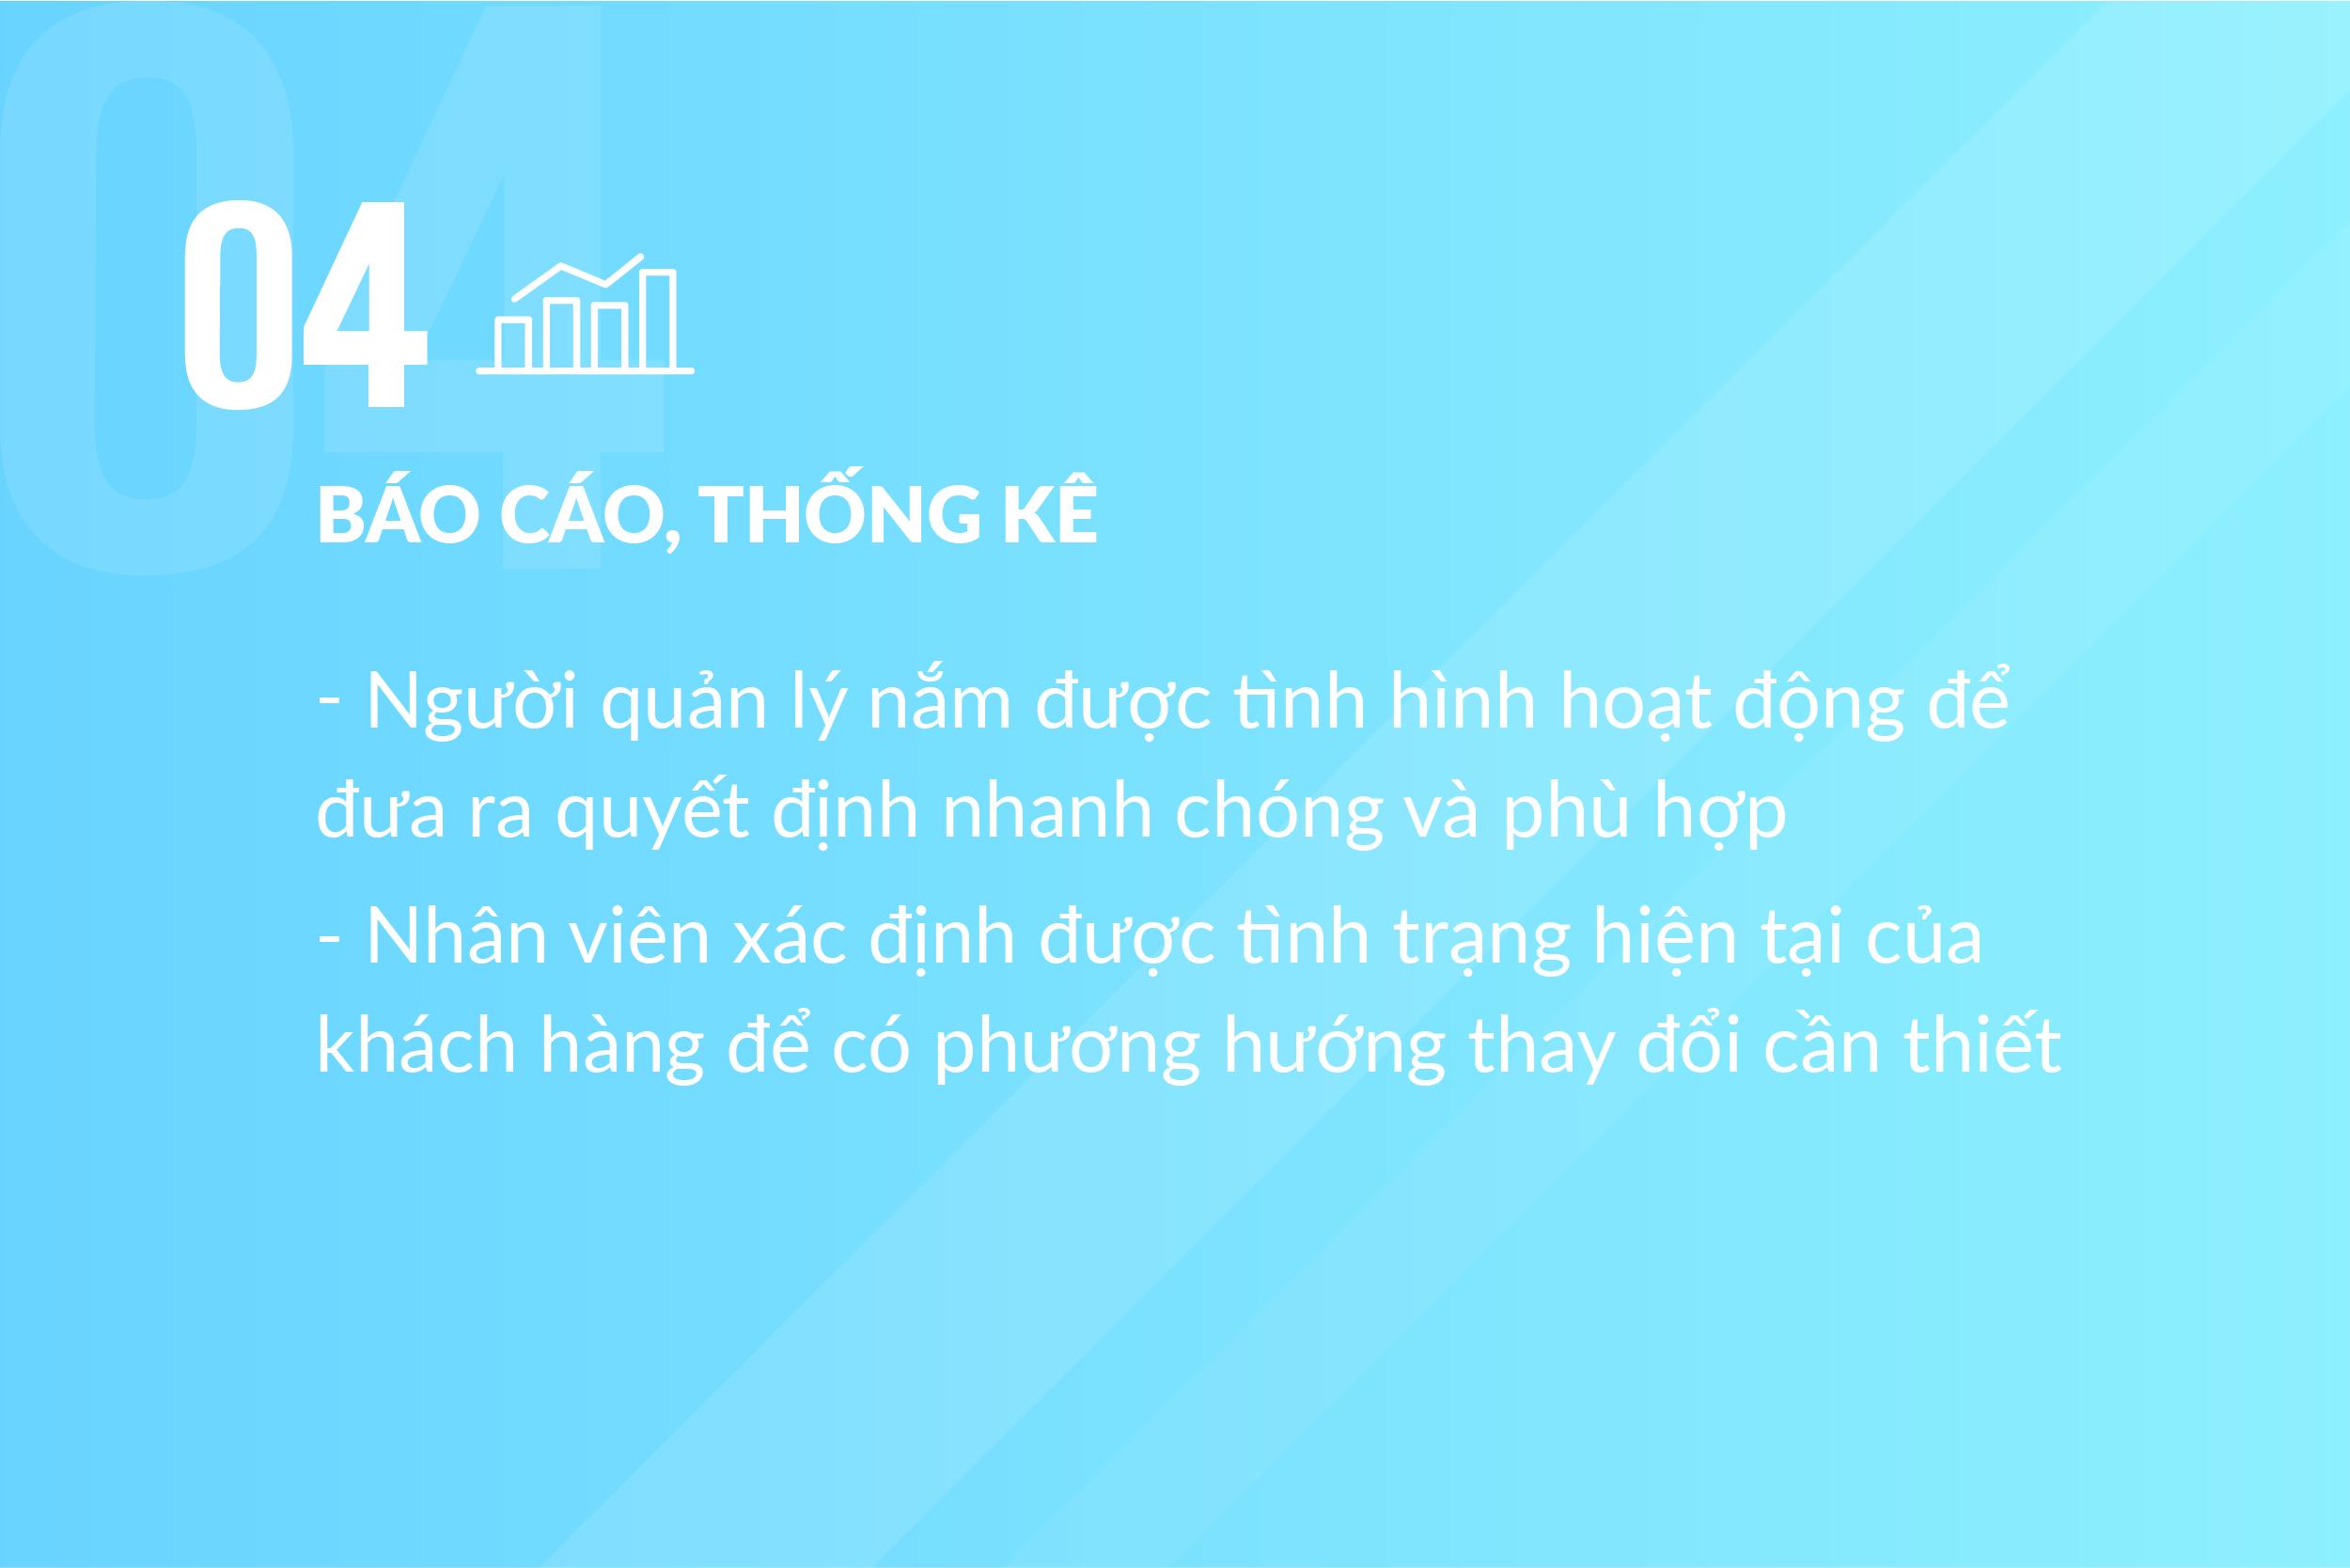 crm-thong-ke-so-lieu